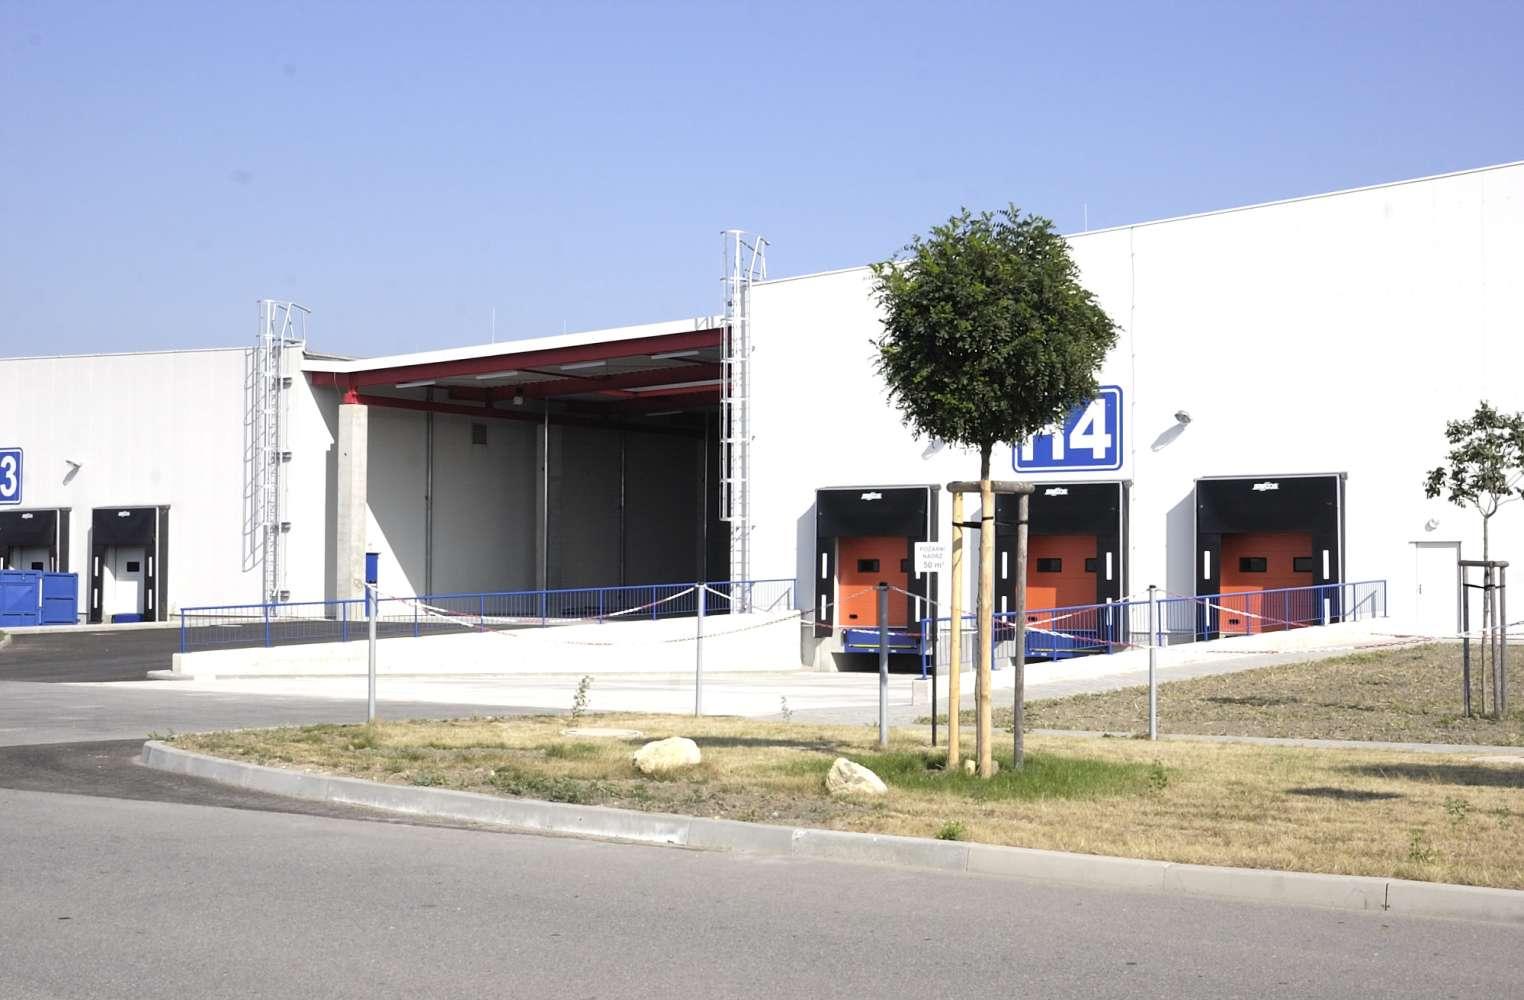 Průmyslové nemovitosti Mlada boleslav - bezdecin,  - UNO Park Mladá Boleslav - Bezděčín